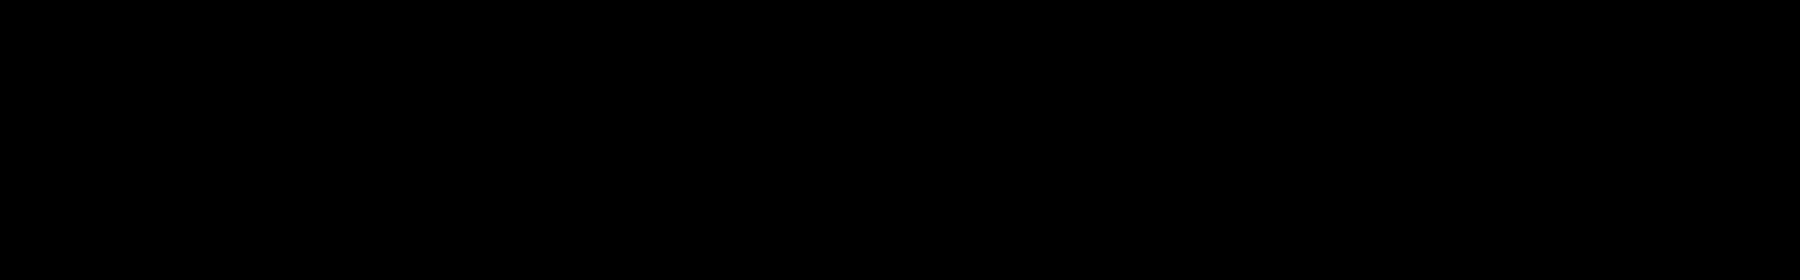 G - House audio waveform